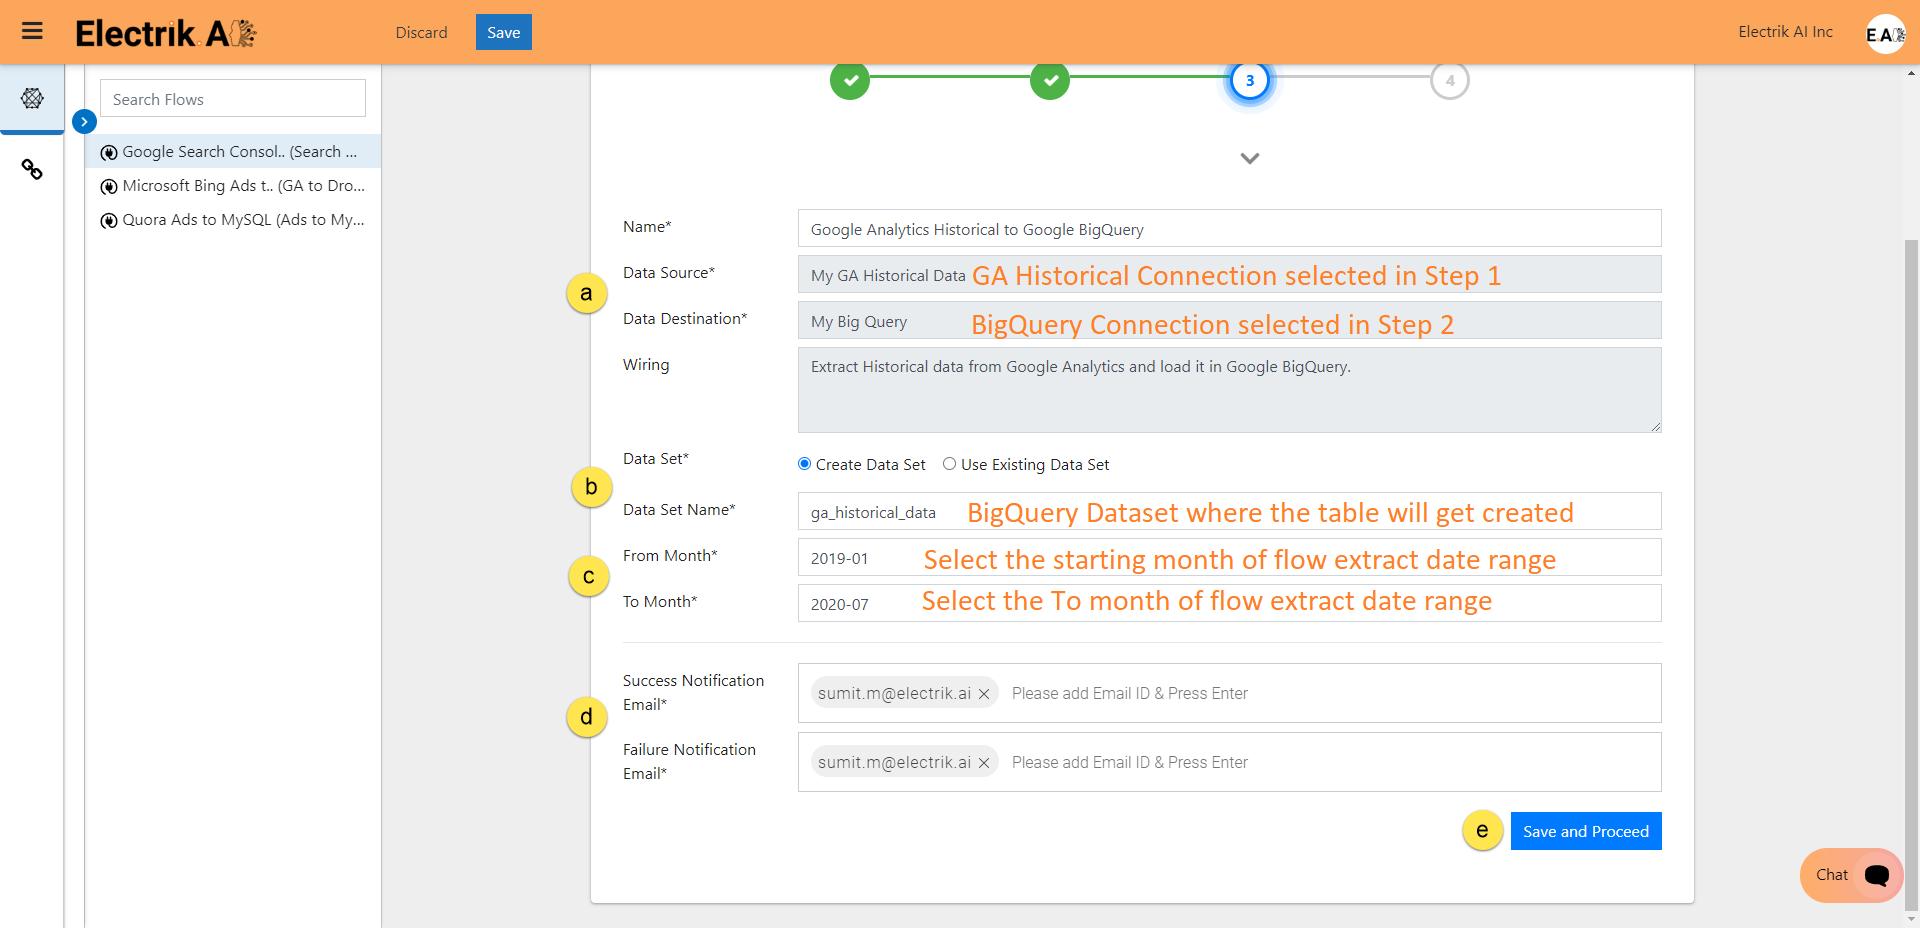 Step 9 Review the Data Source, Data Destination-ElectrikAI